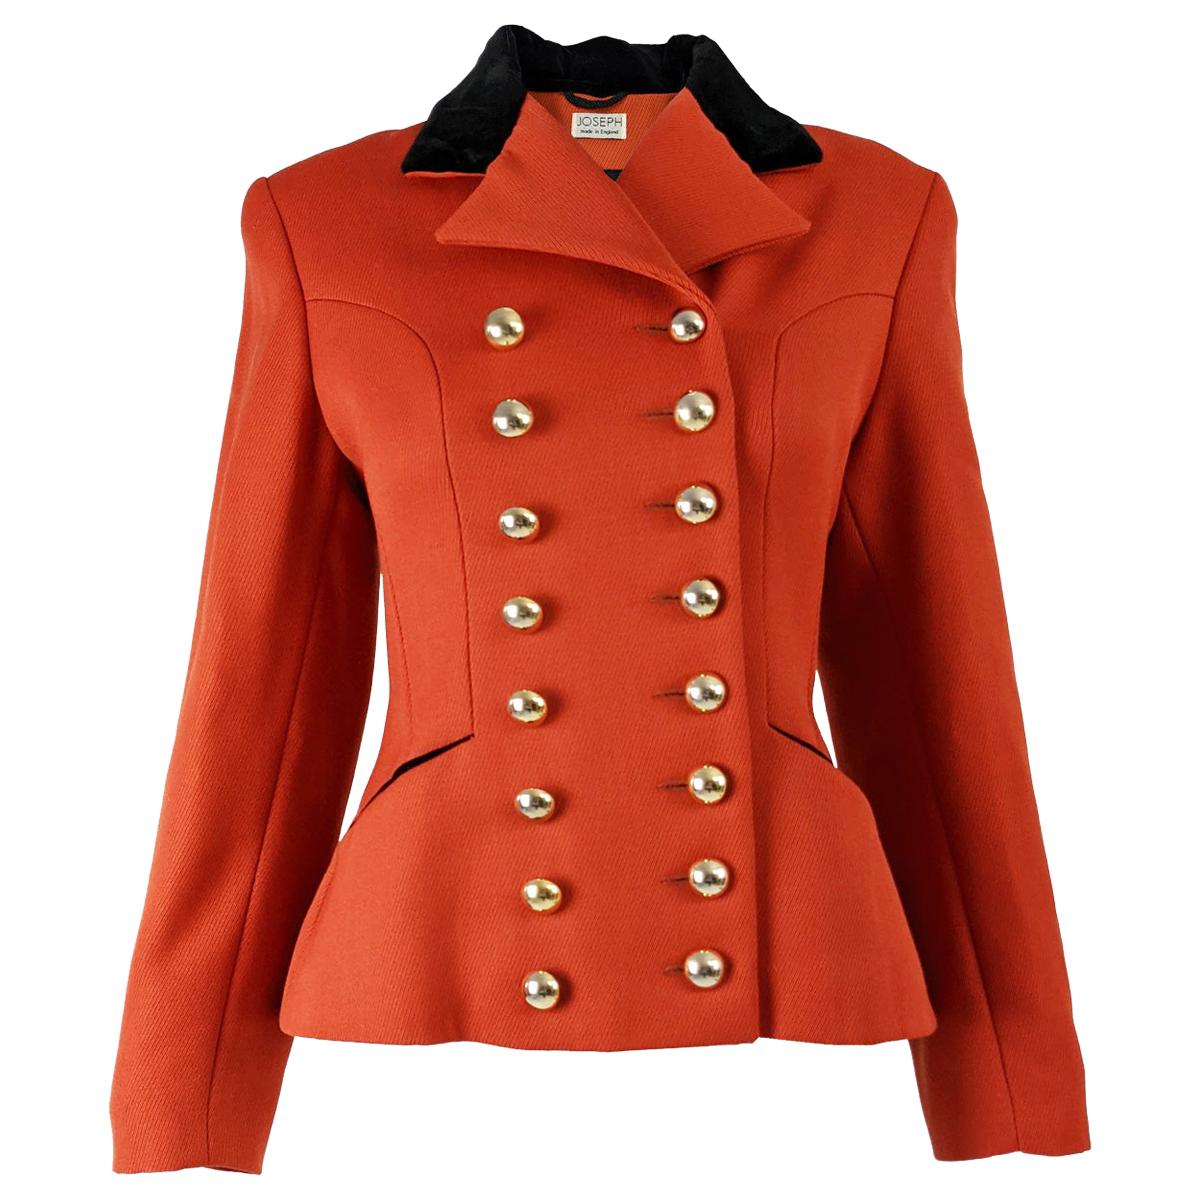 Joseph Vintage Womens Equestrian Style Wool Blazer Jacket